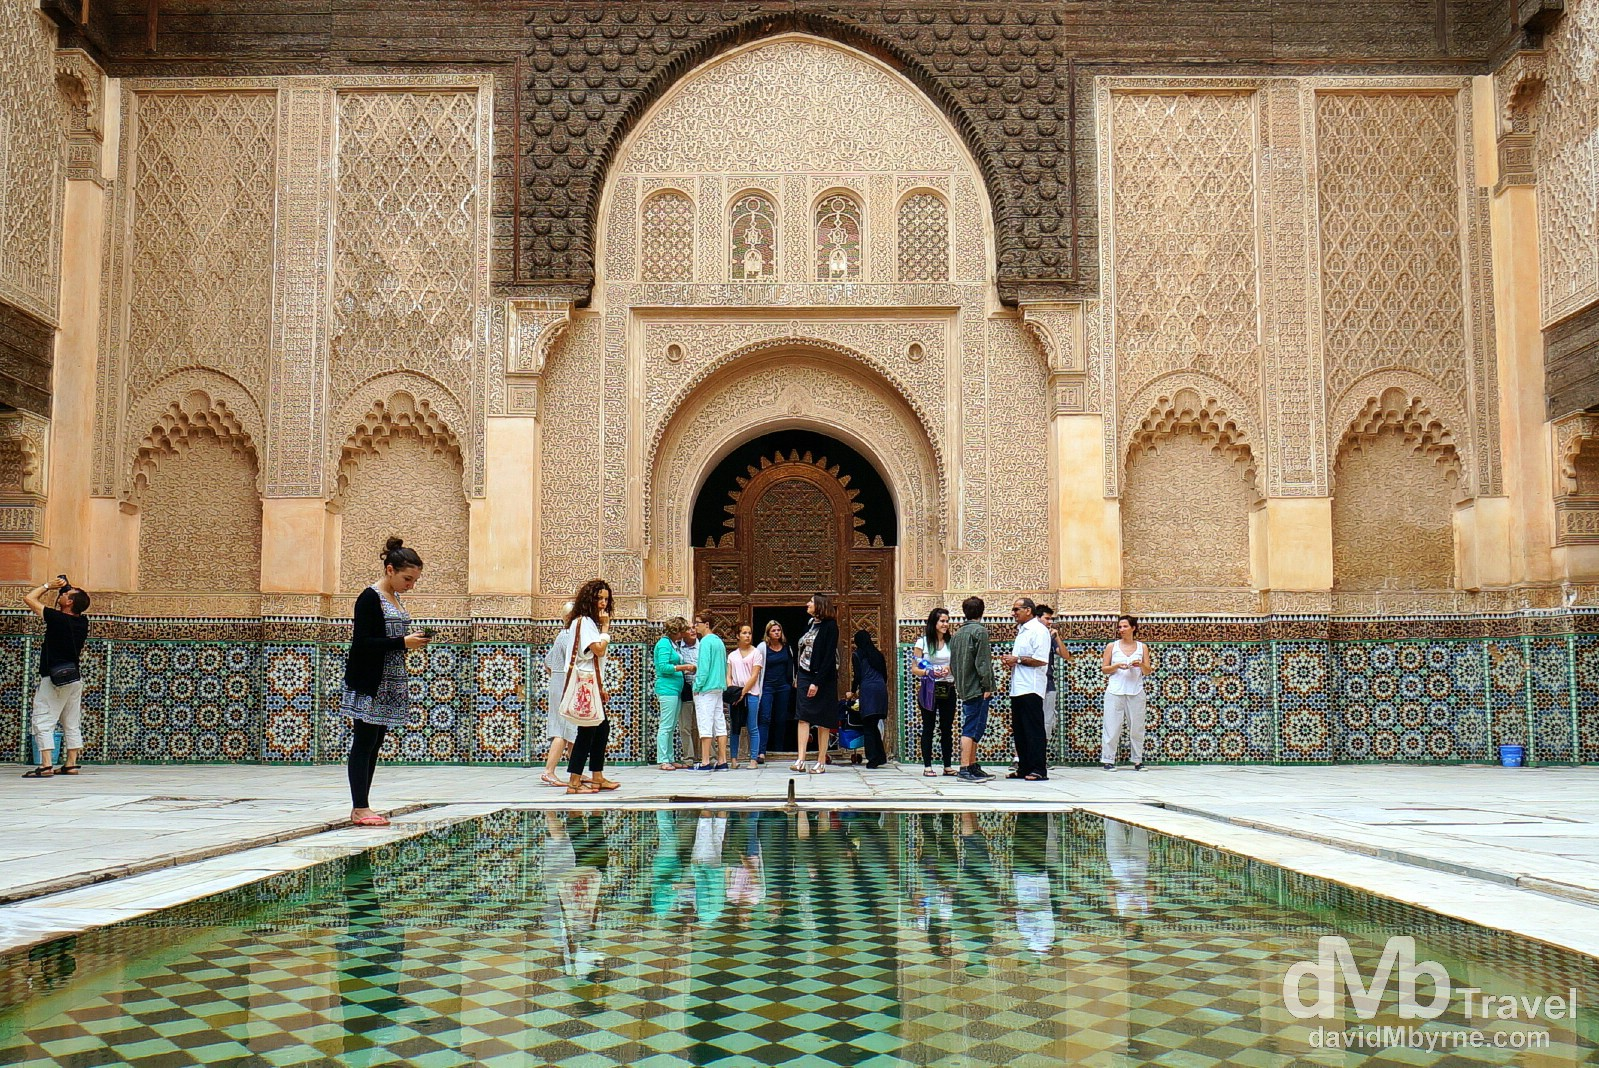 Ali ben Youssef Medersa, Marrakesh, Morocco